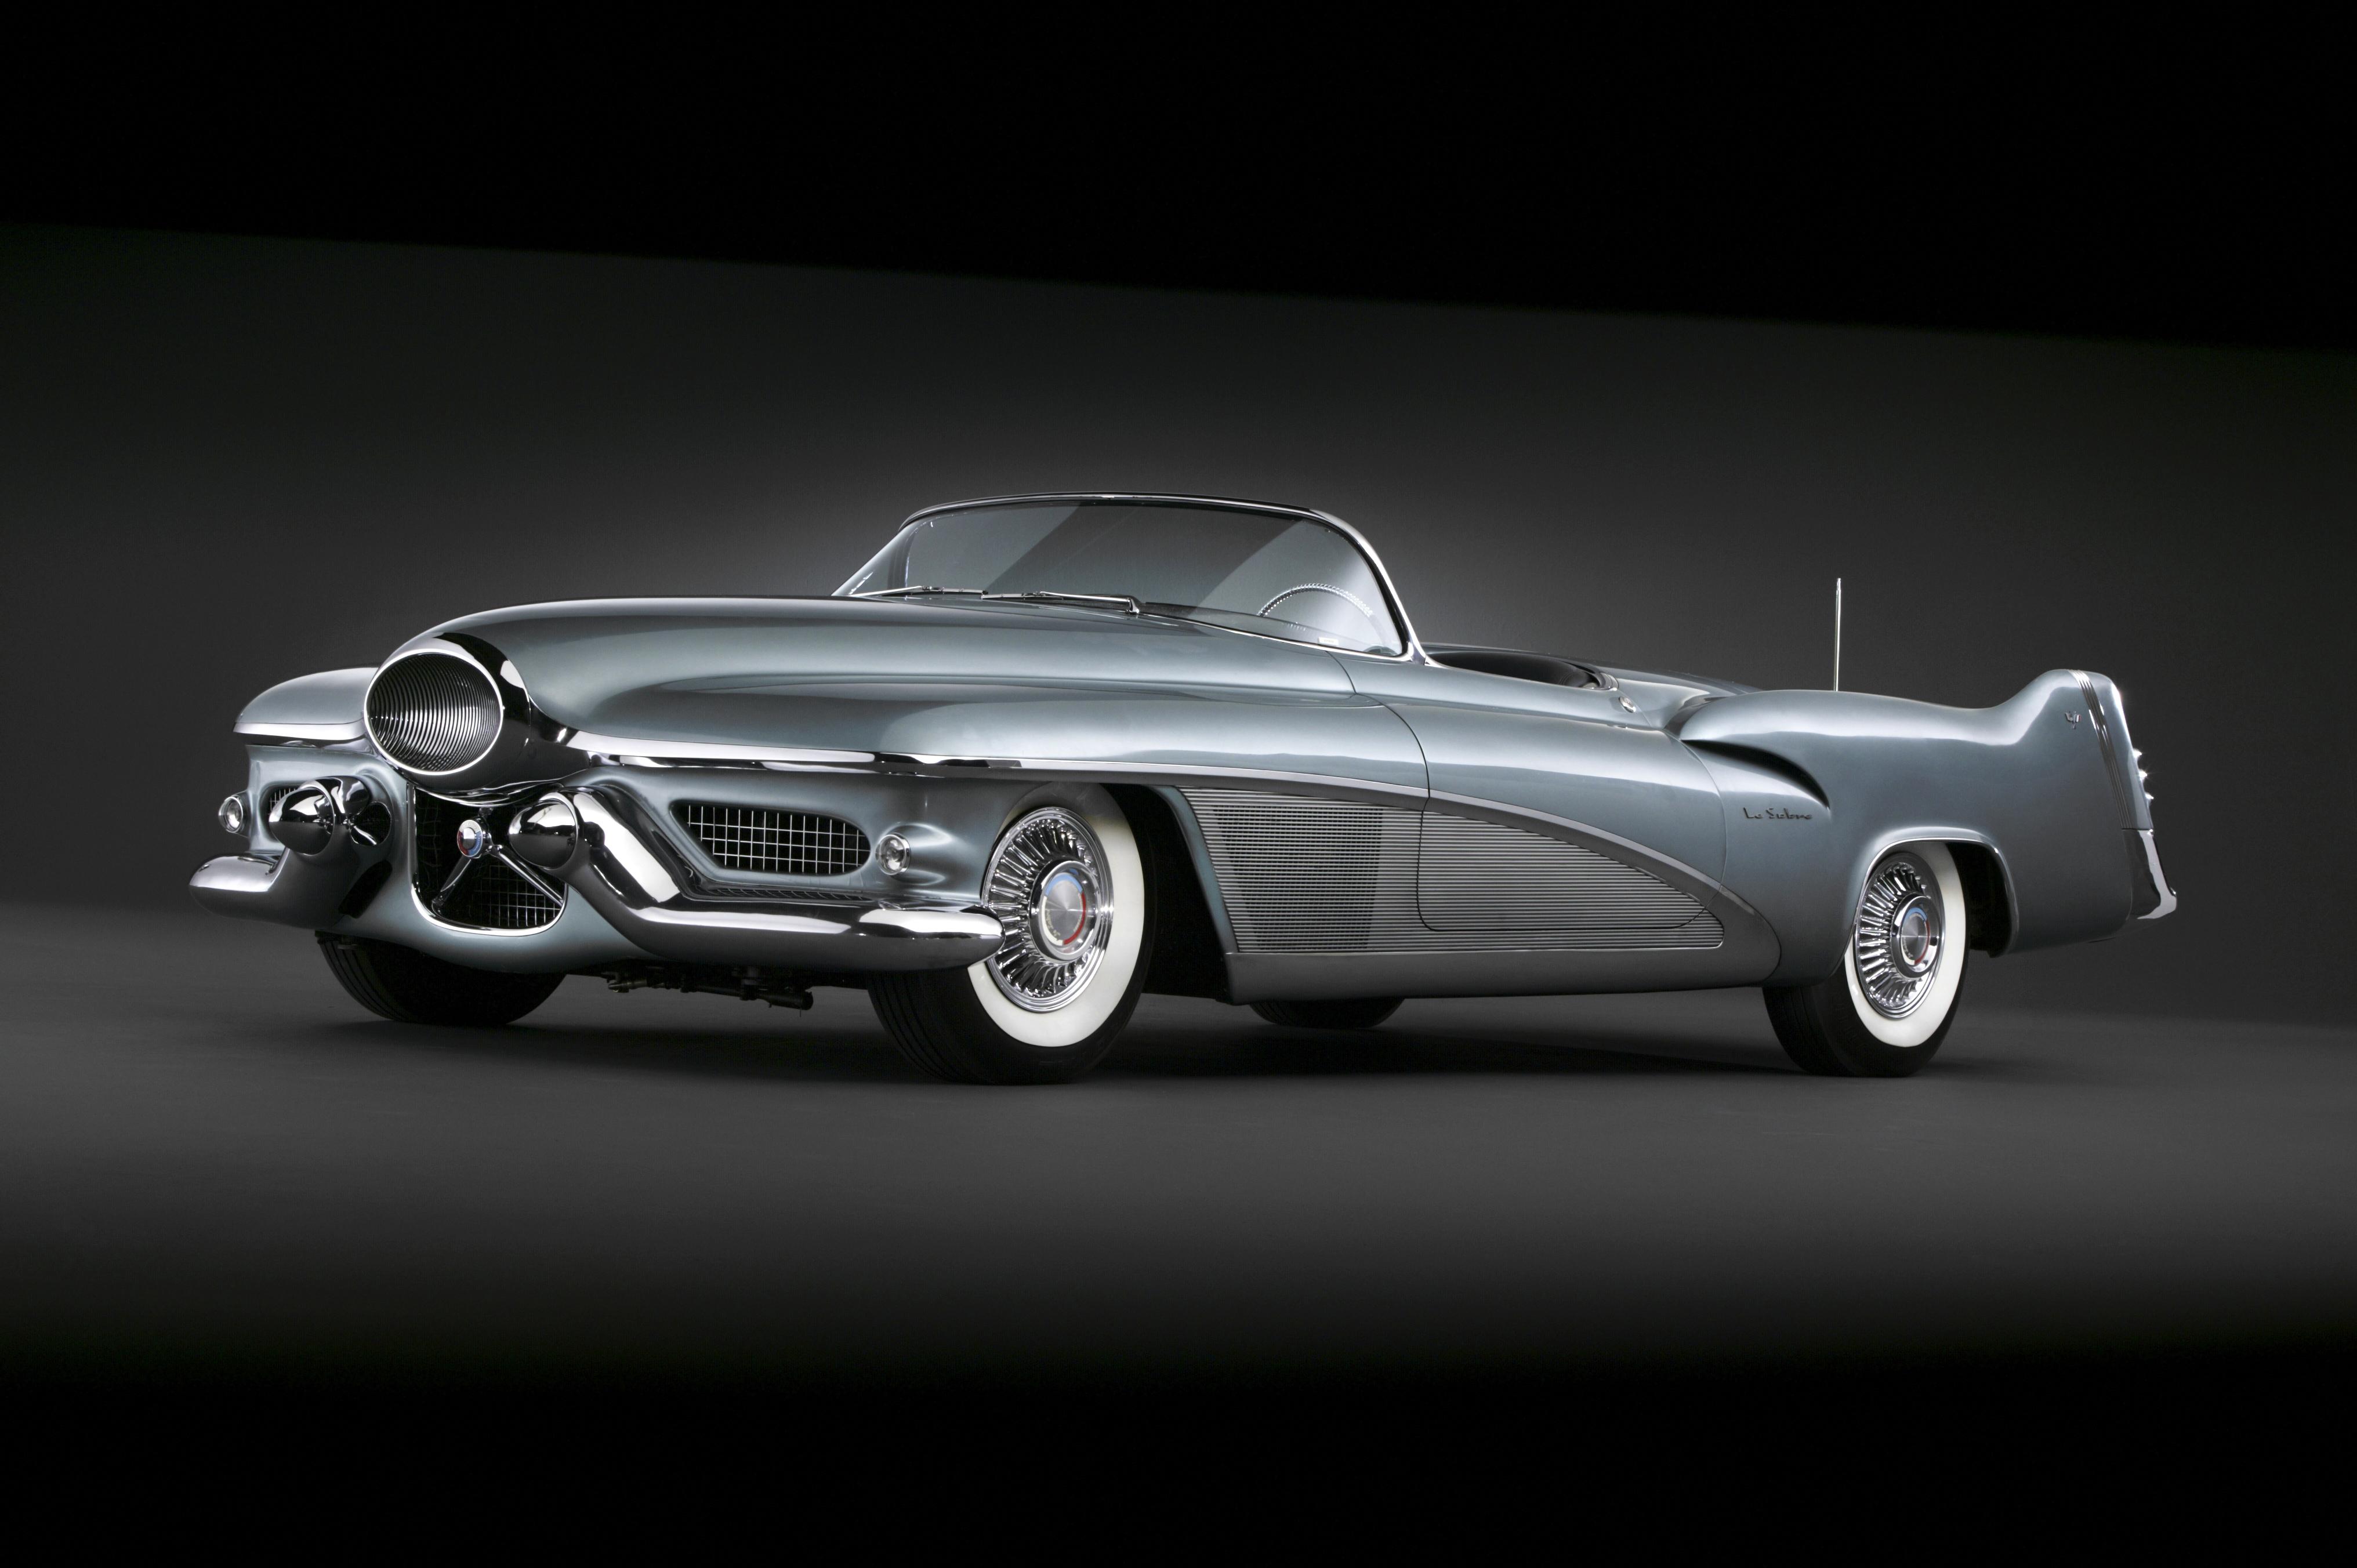 Photos Videos Ed Welburn Gm Retirement 51 Buick Lesabre Concept